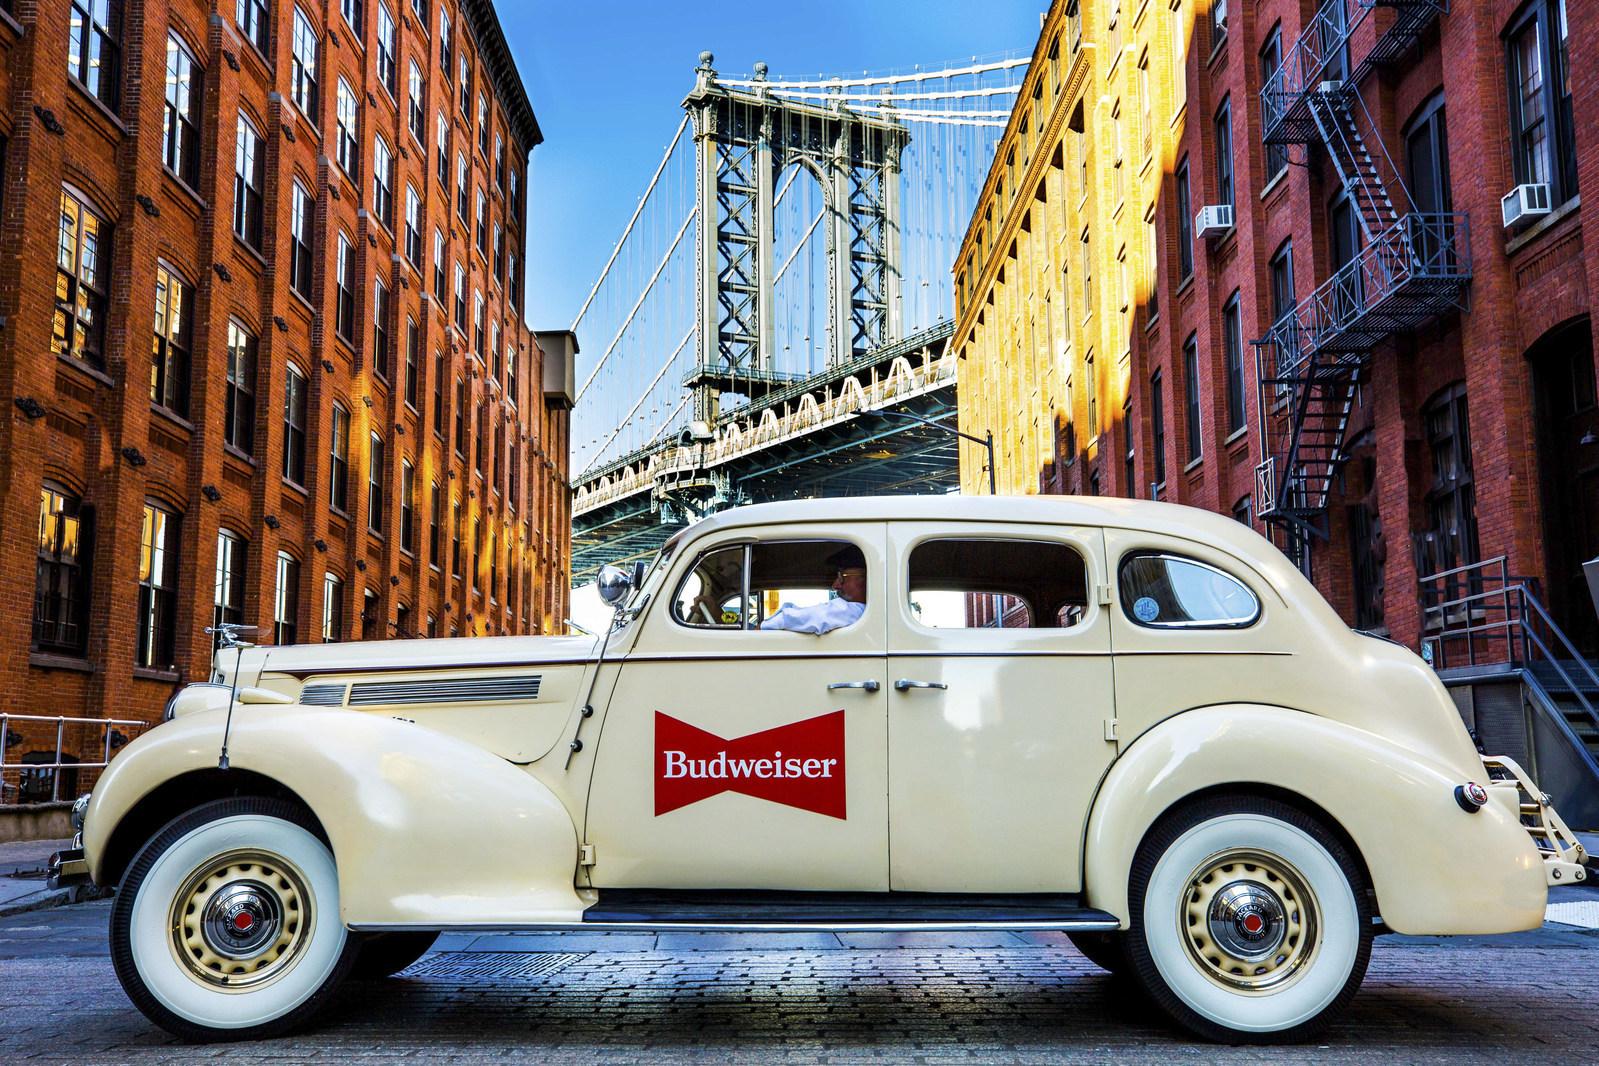 Budweiser-Lyft-Fleet-of-Vintage-Cars